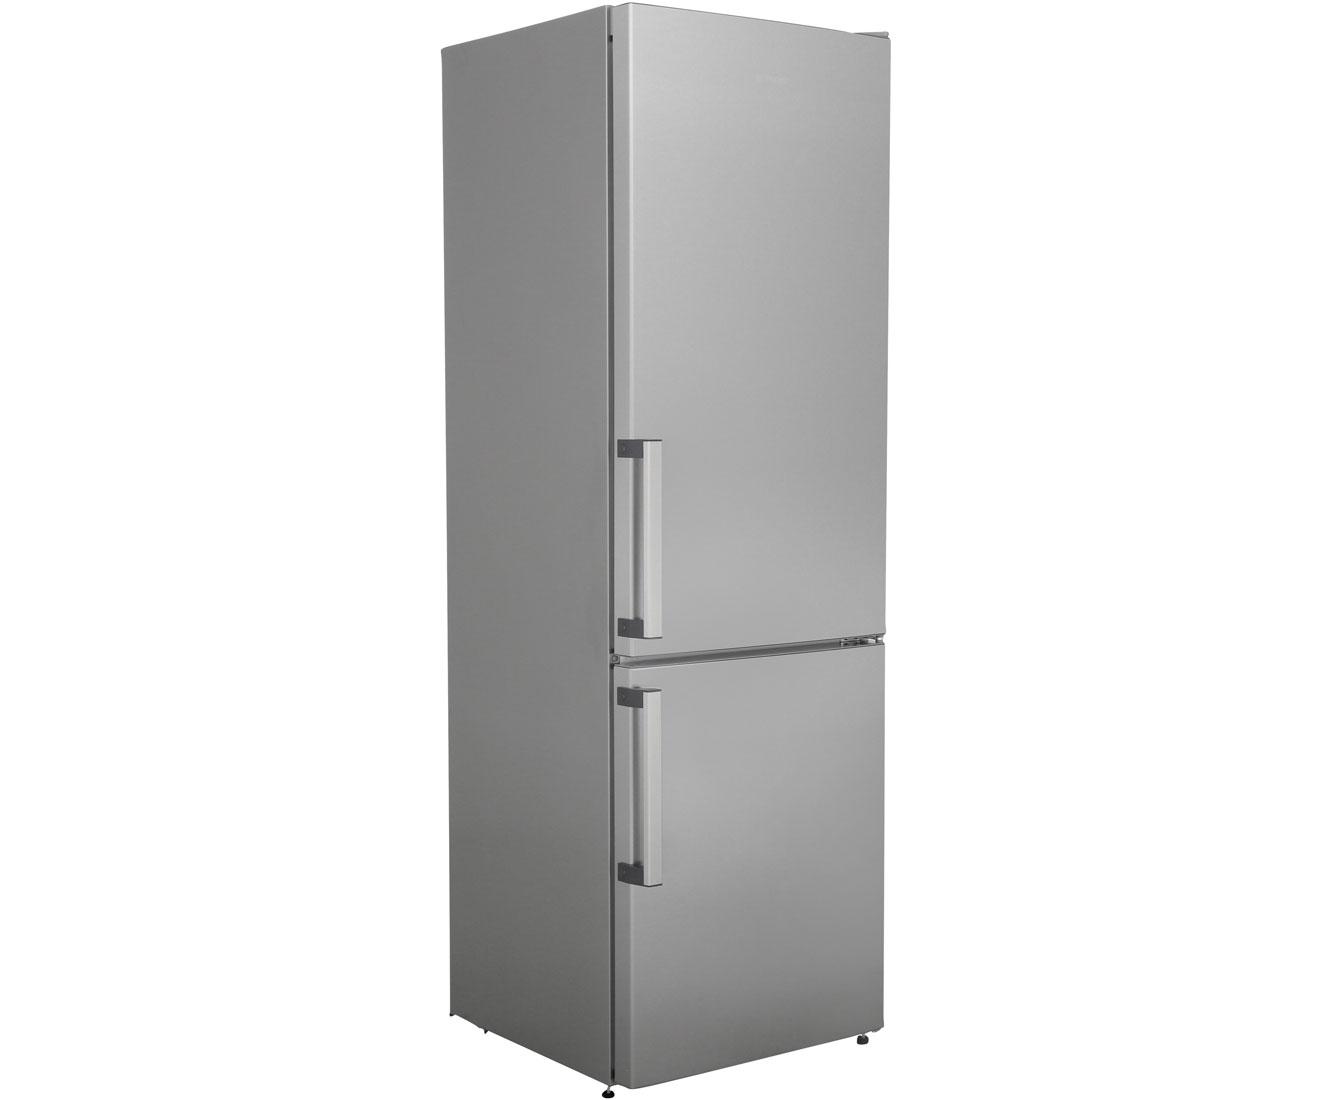 Gorenje Kühlschrank Hti 1426 : Gorenje kühlschrank hti ersatzteile gorenje kühlschrank hti